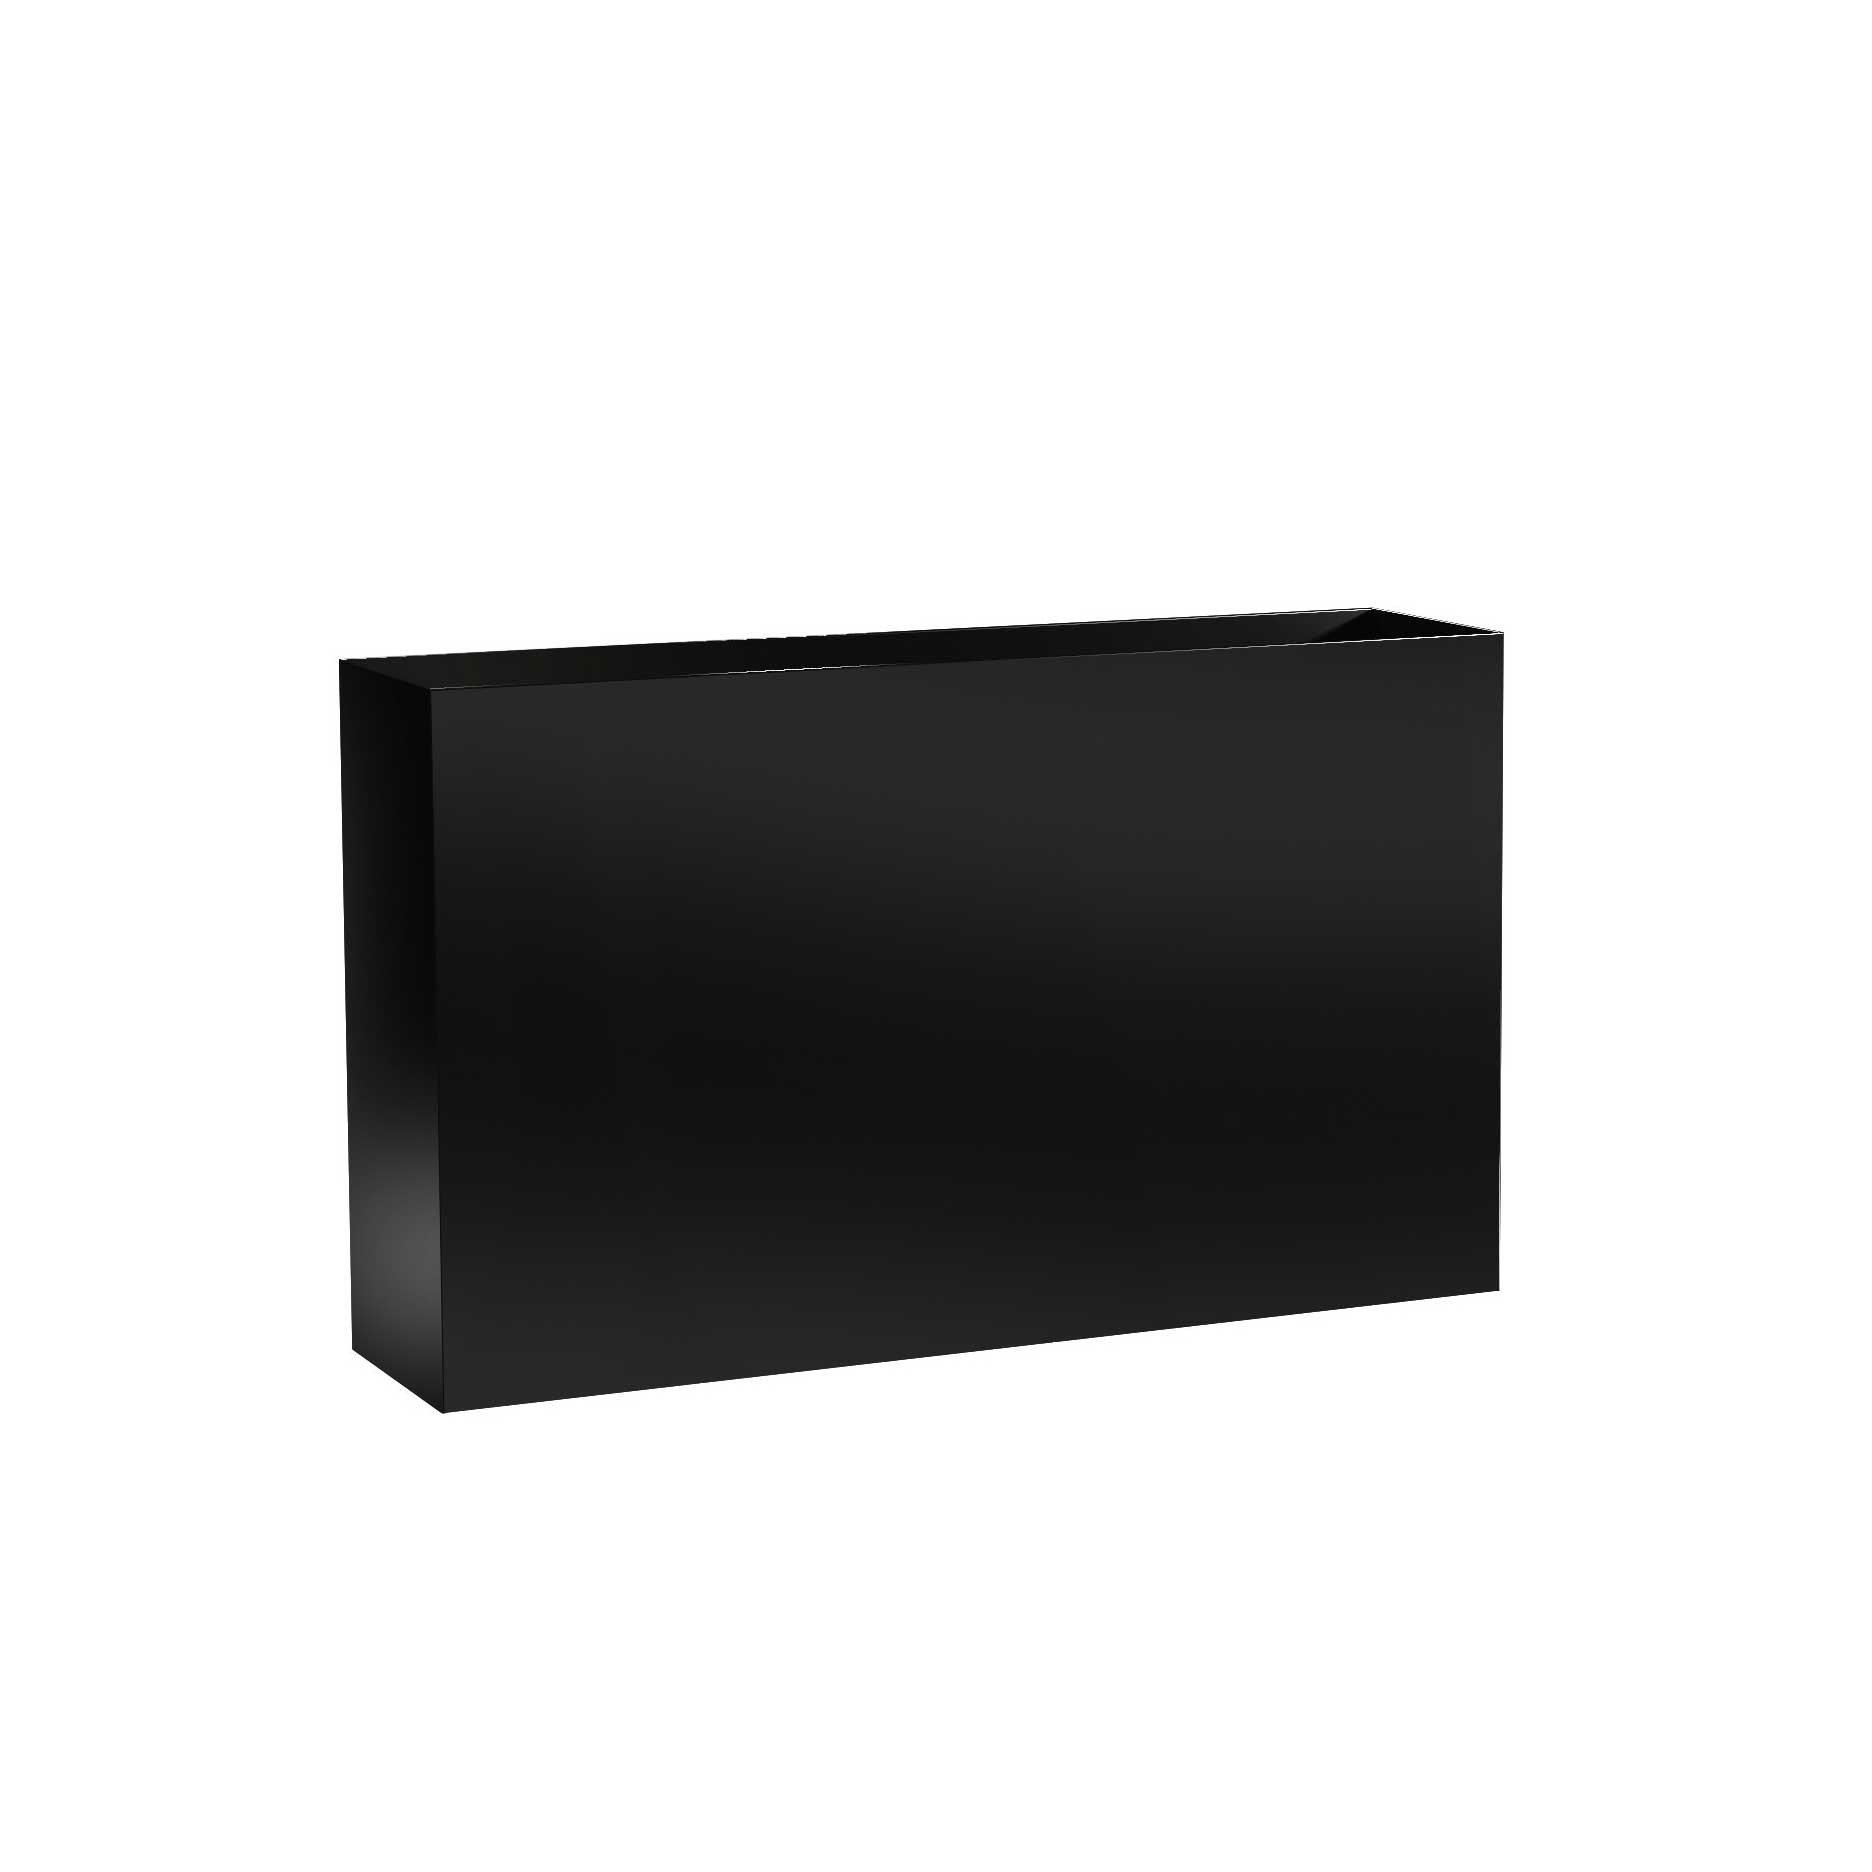 Modern Metal Planter Boxes - Aluminum - 24' Tall, (32'/36'/40' Length, 10' Width)